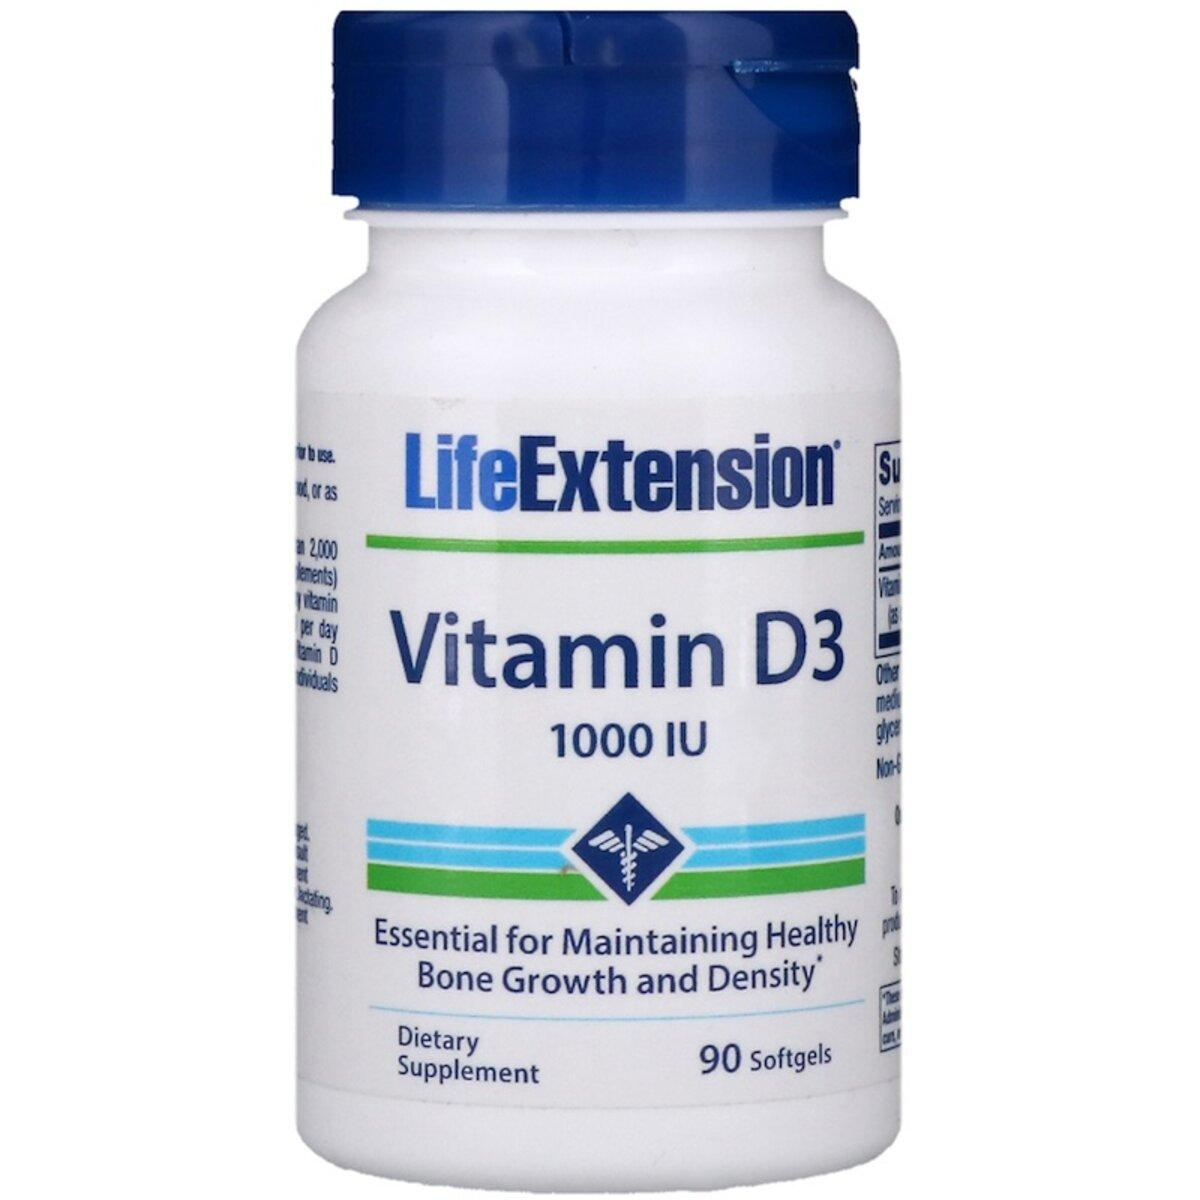 Витамин D3, Vitamin D3, Life Extension, 25 мкг (1000 МЕ), 90 гелевых капсул